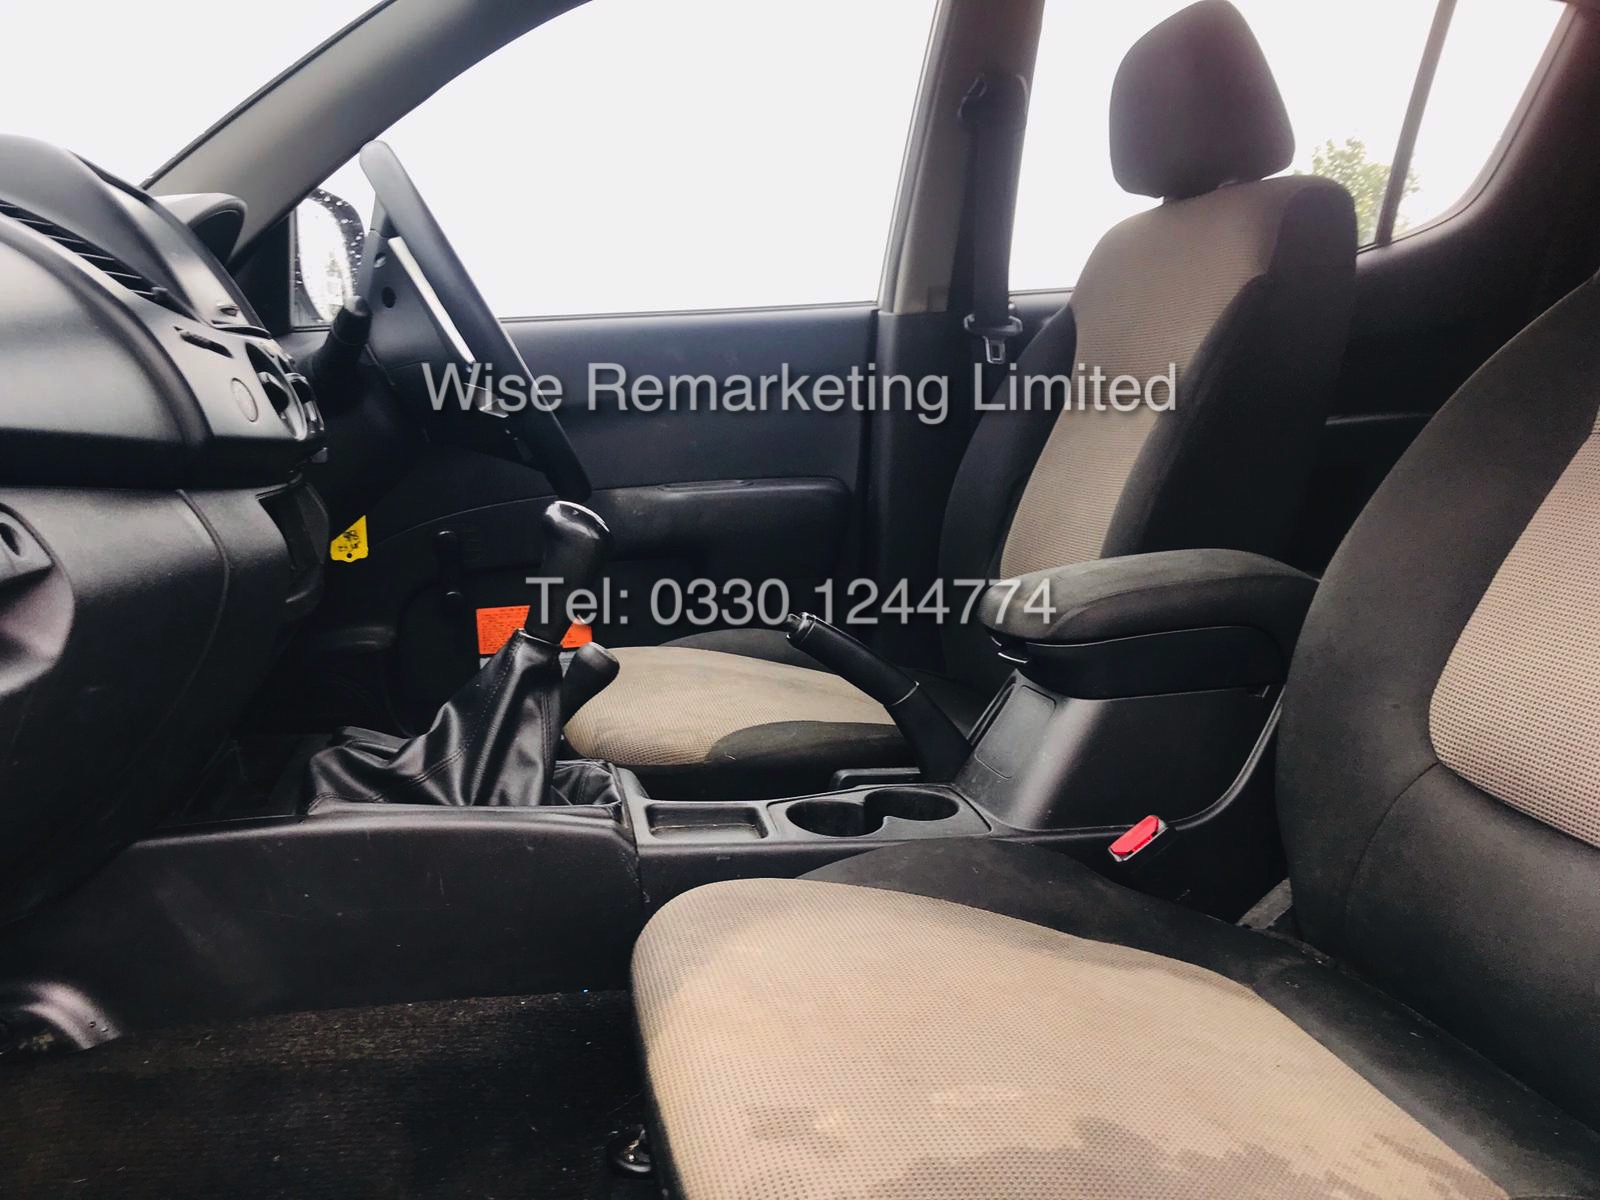 Lot 9 - **RESERVE MET** MITSUBISHI L200 DOUBLE CAB 2.5 DI-D 4WORK 4WD 2015 MODEL WHITE